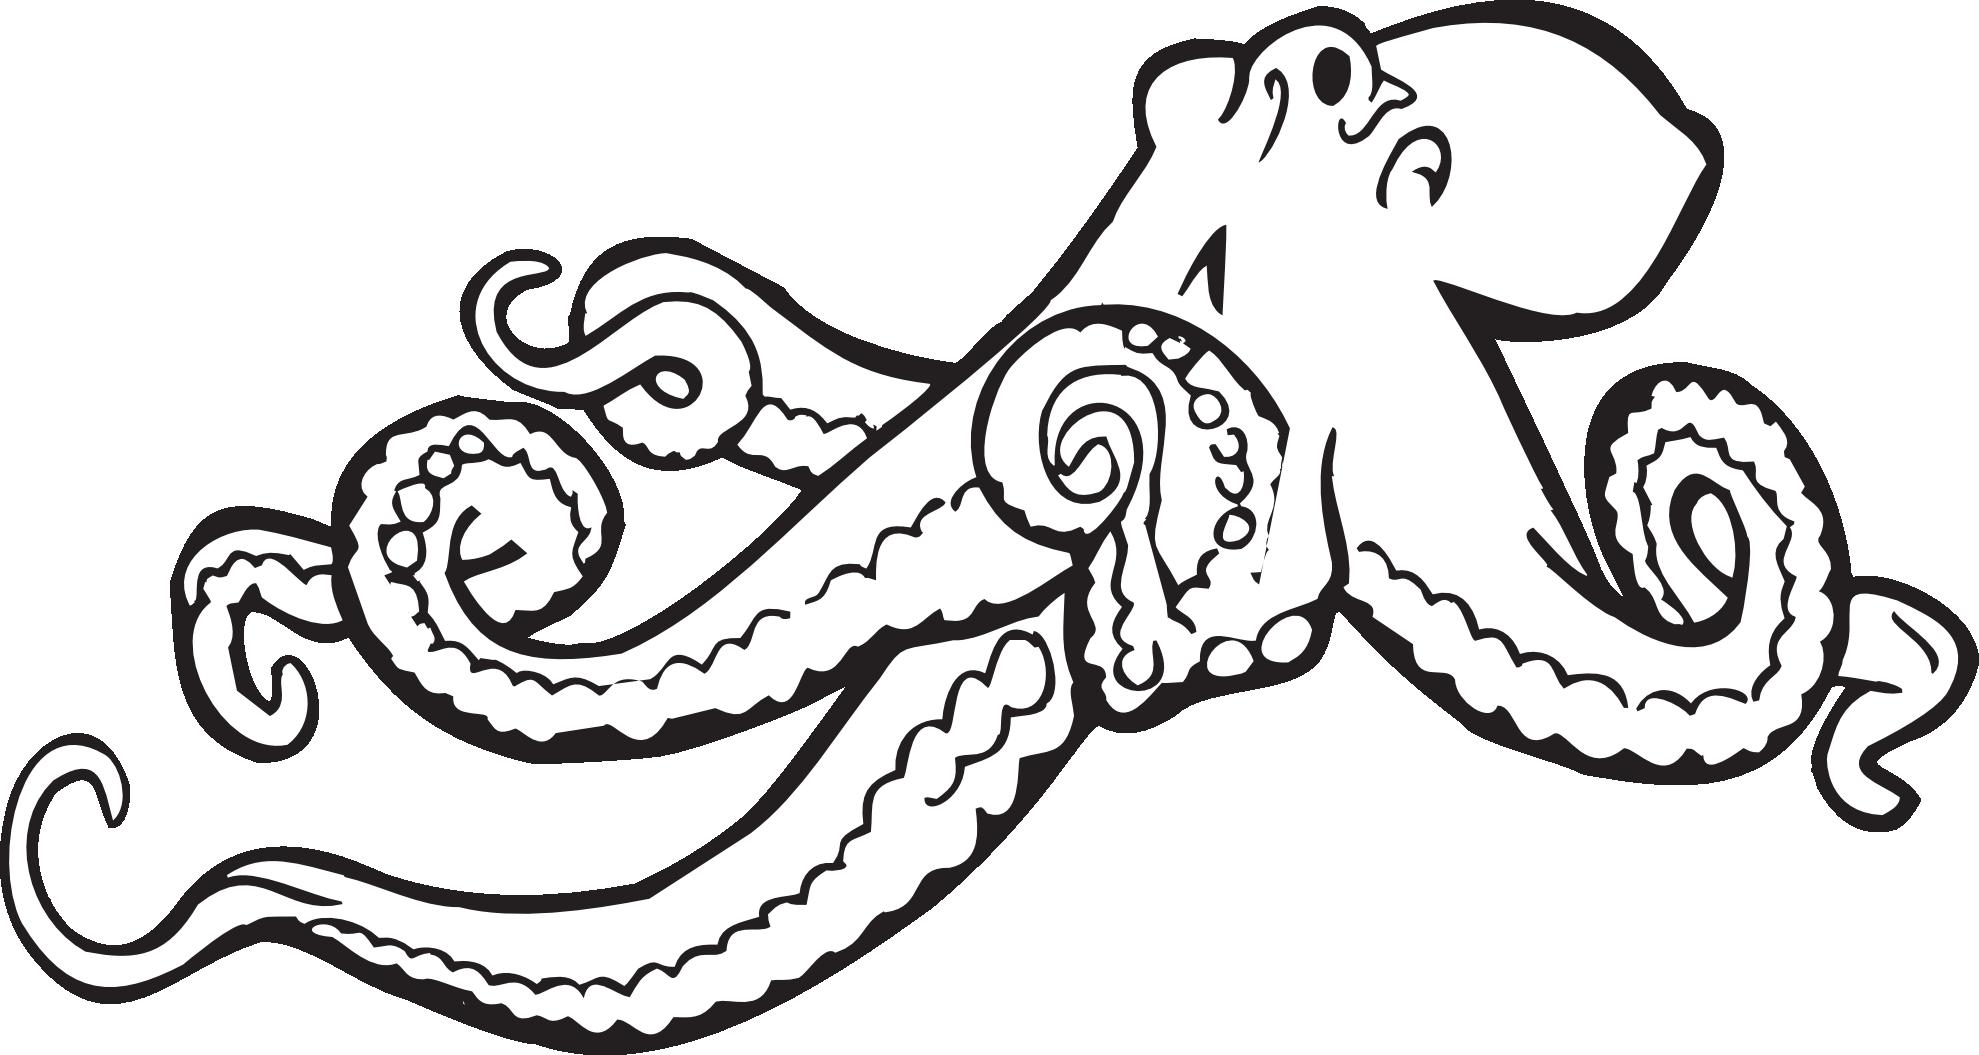 Octopus coloring #13, Download drawings